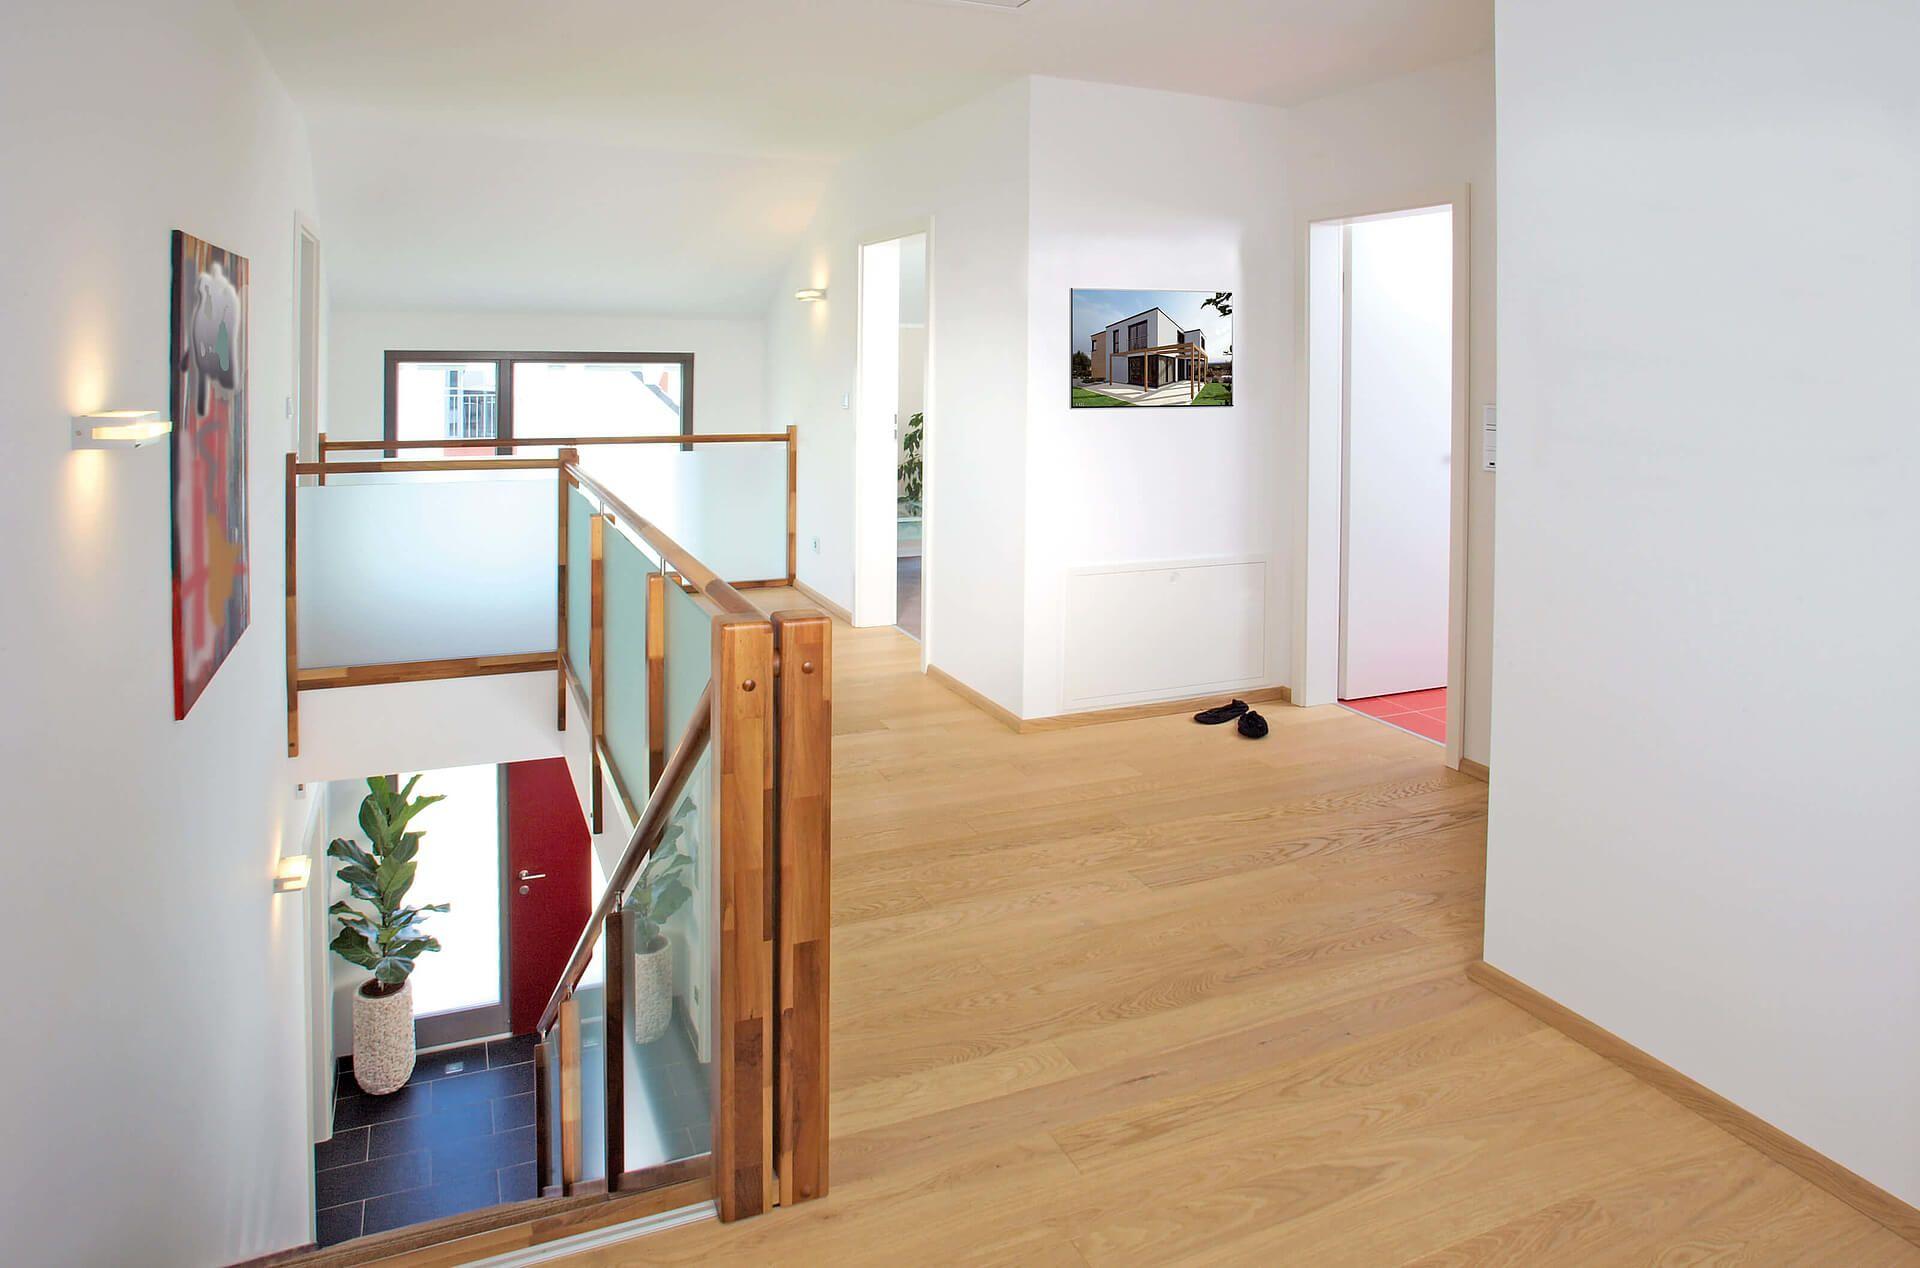 Heller Holzfußboden ~ Galerie heller holzfußboden weiße wände treppe treppengeländer aus